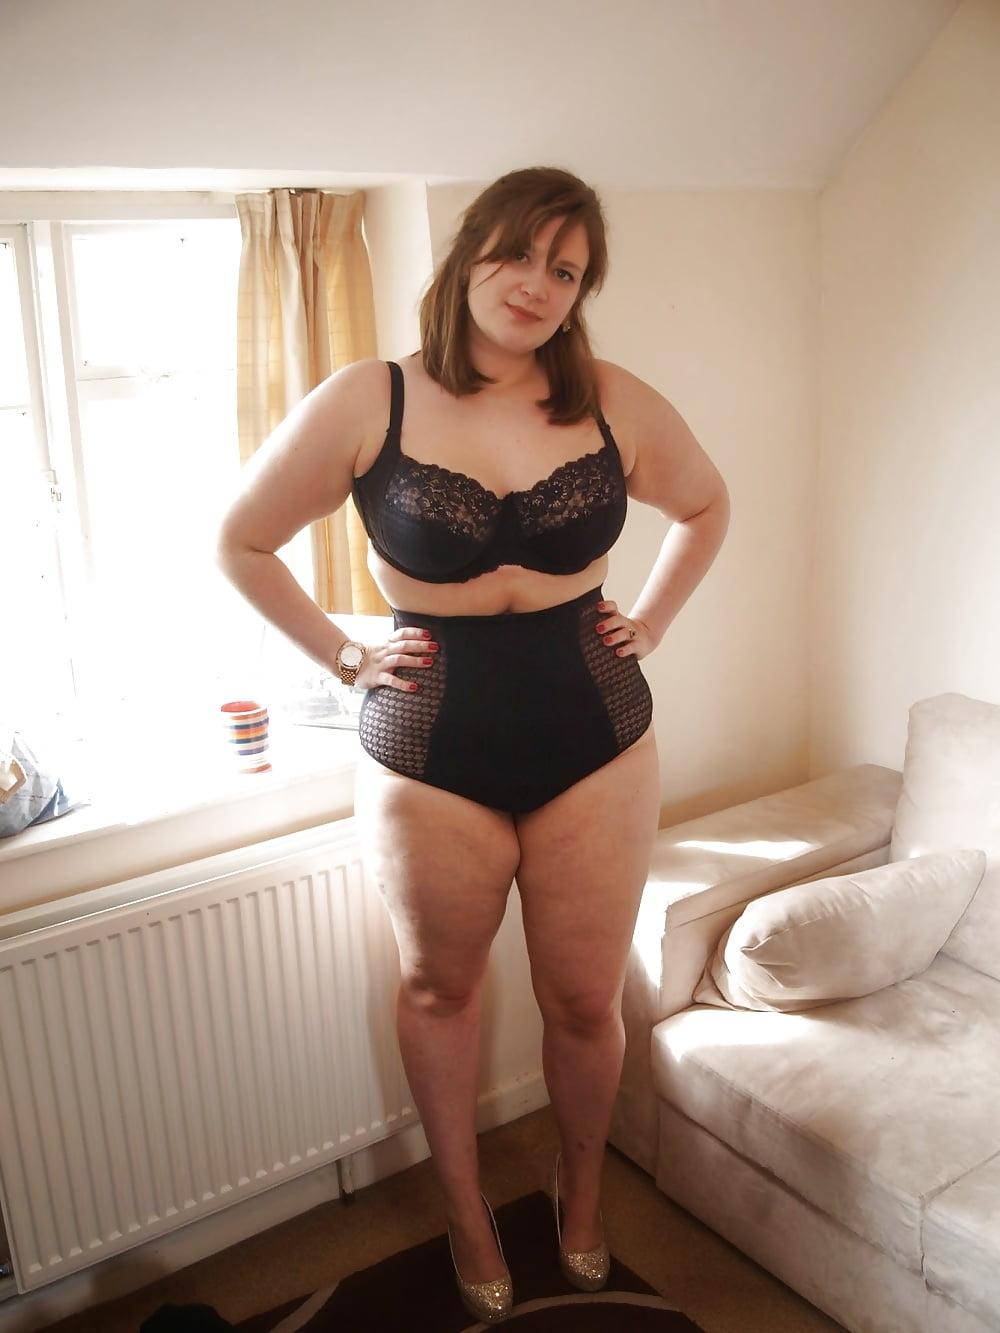 Fat girl sex pics — img 10